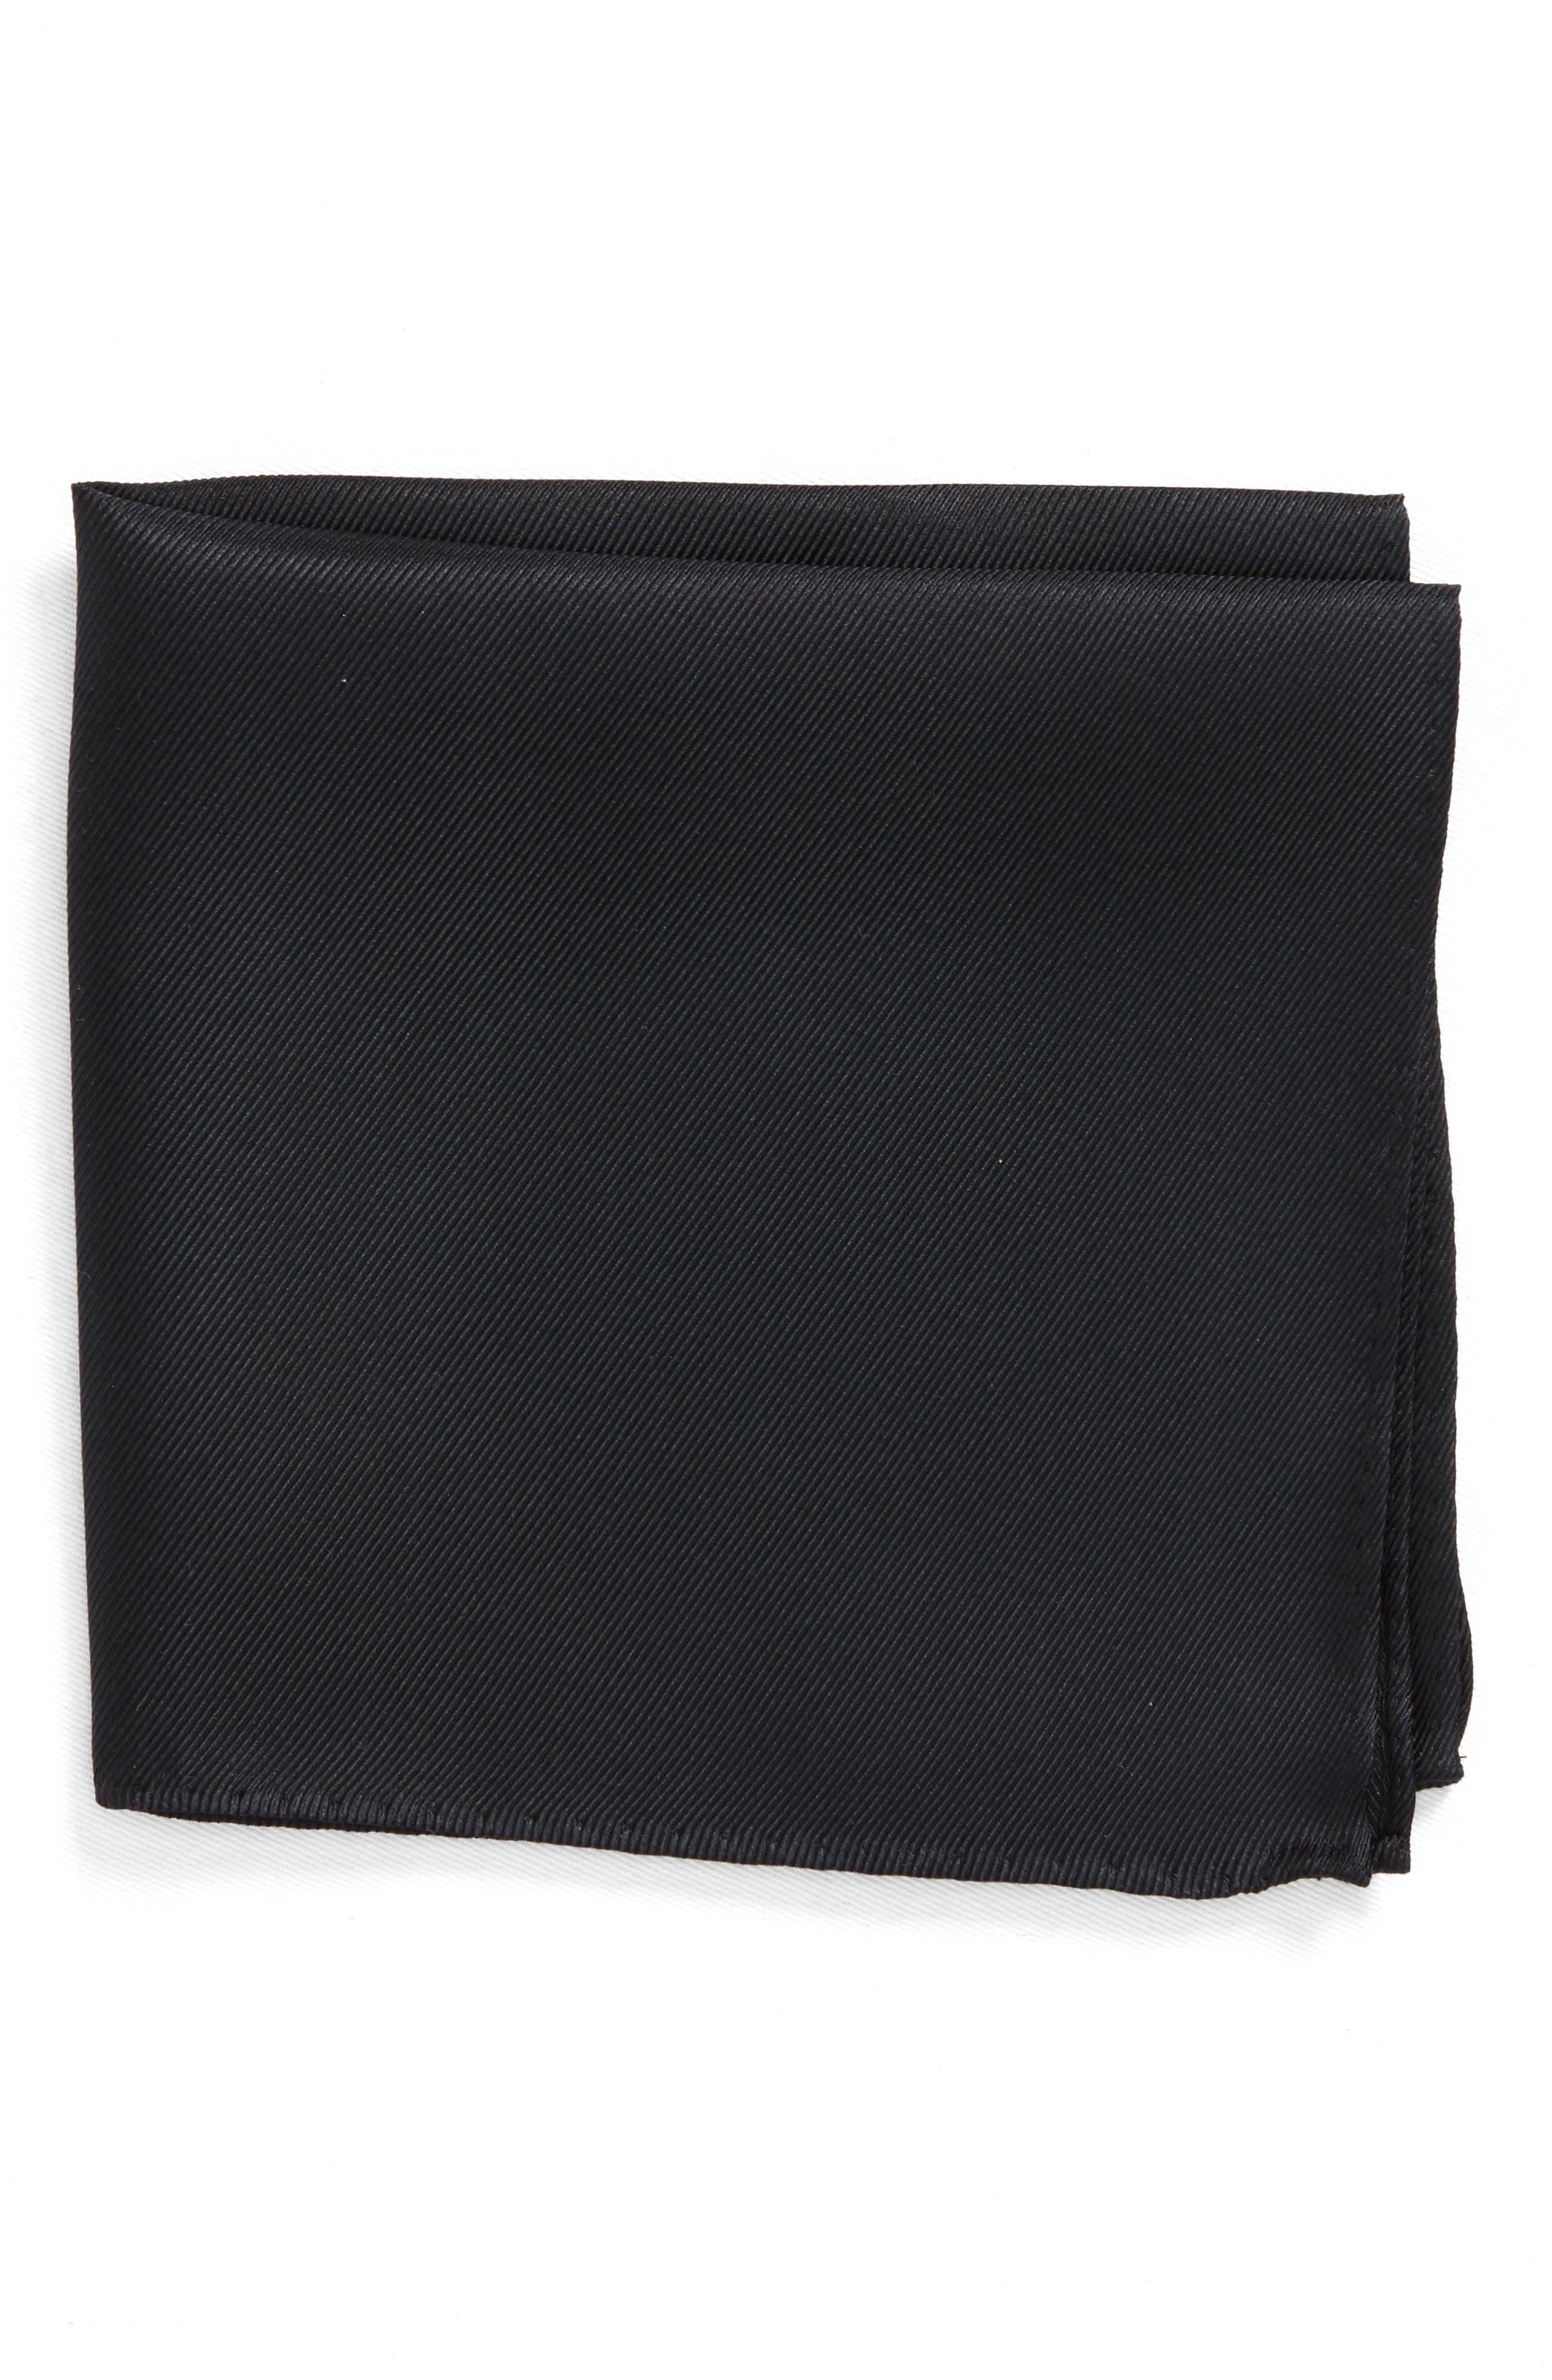 King Twill Silk Pocket Square,                             Main thumbnail 1, color,                             BLACK